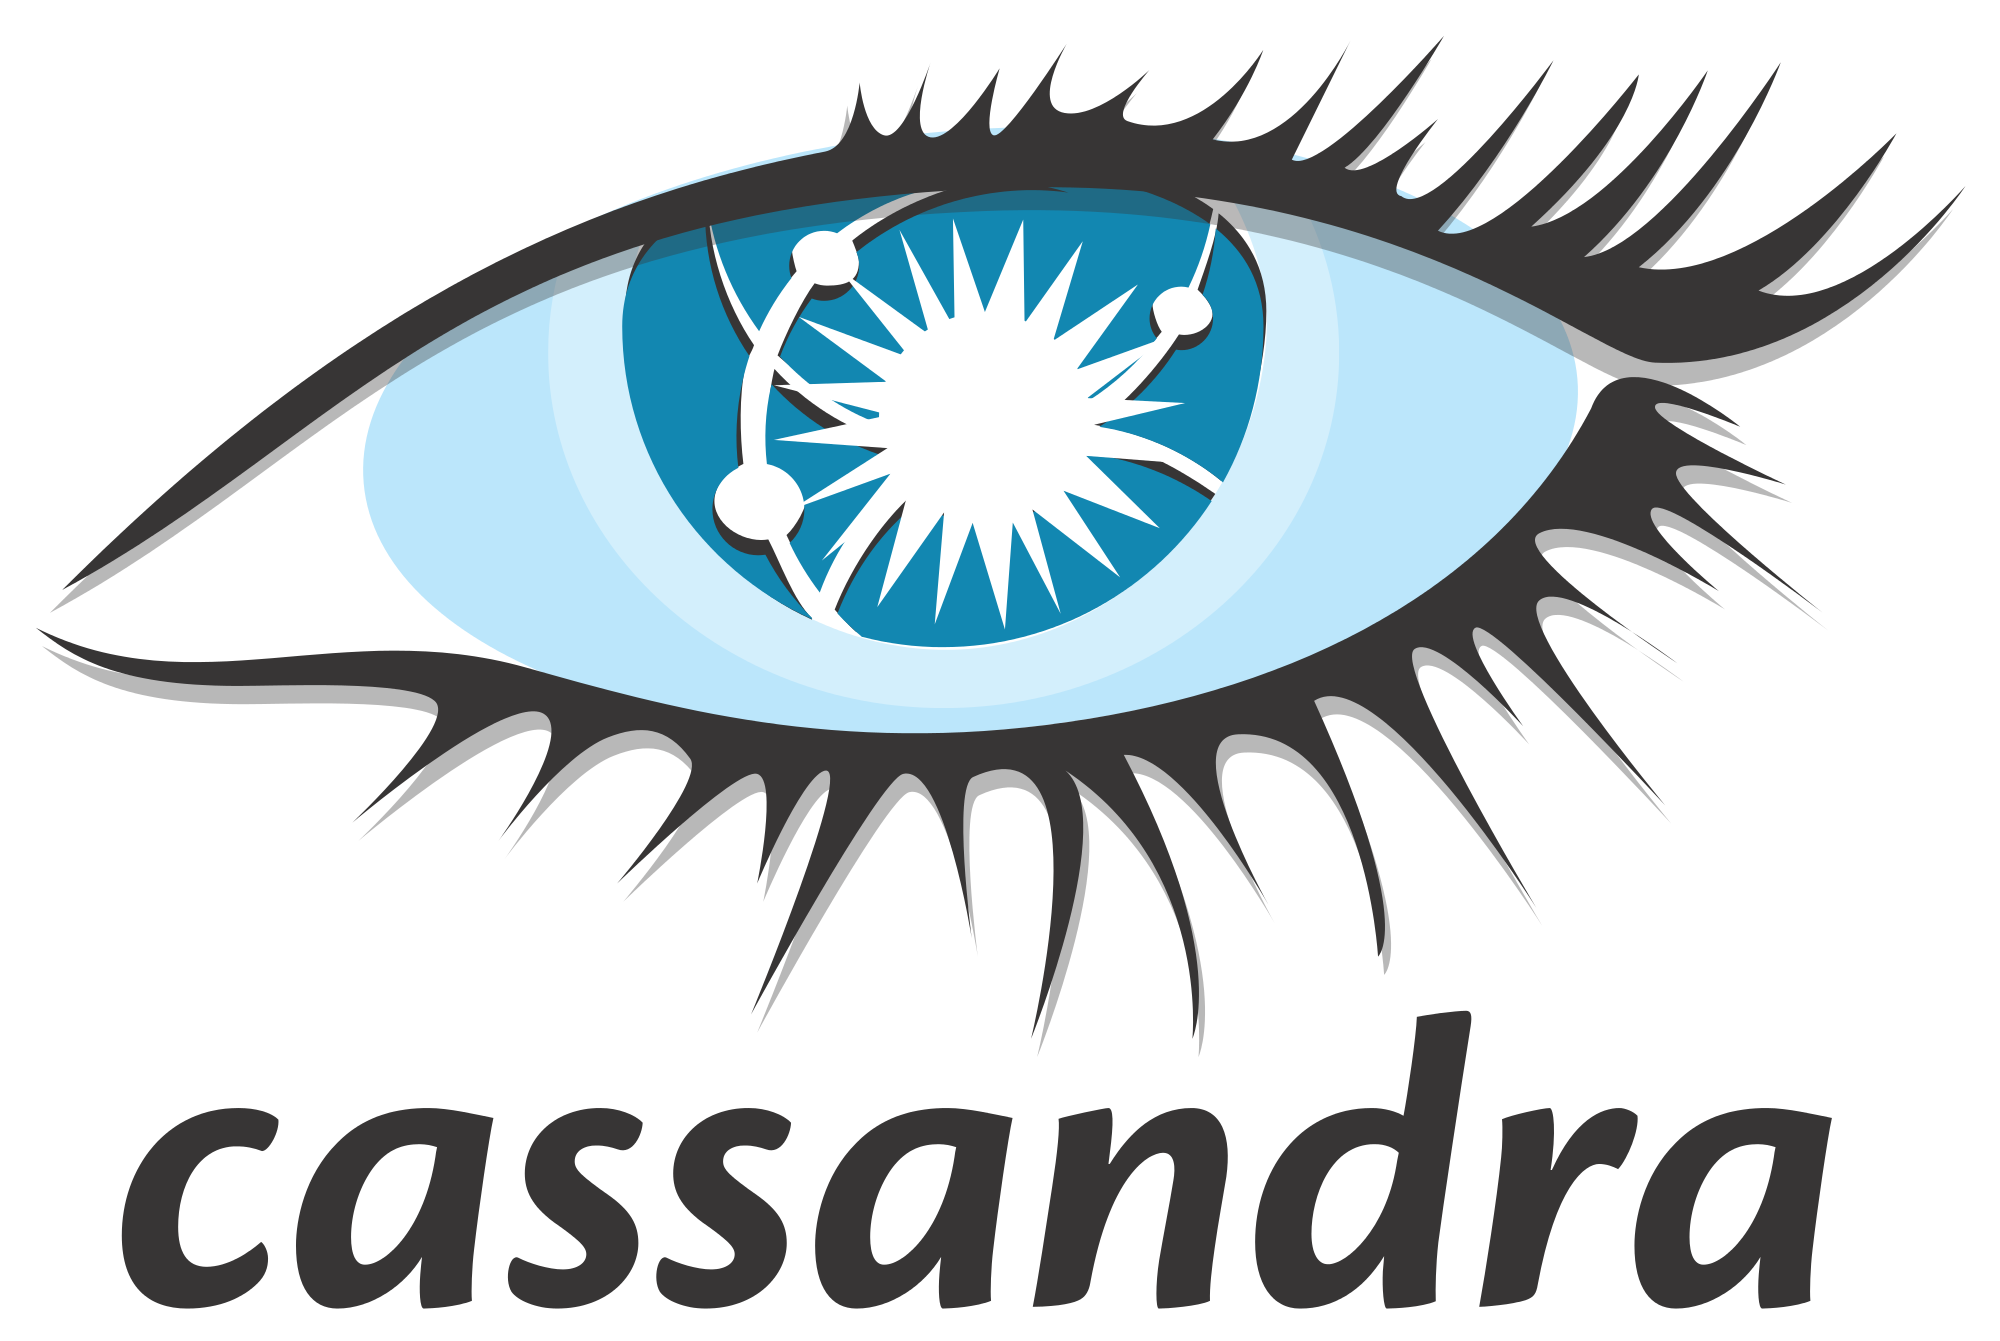 ApacheCassandra